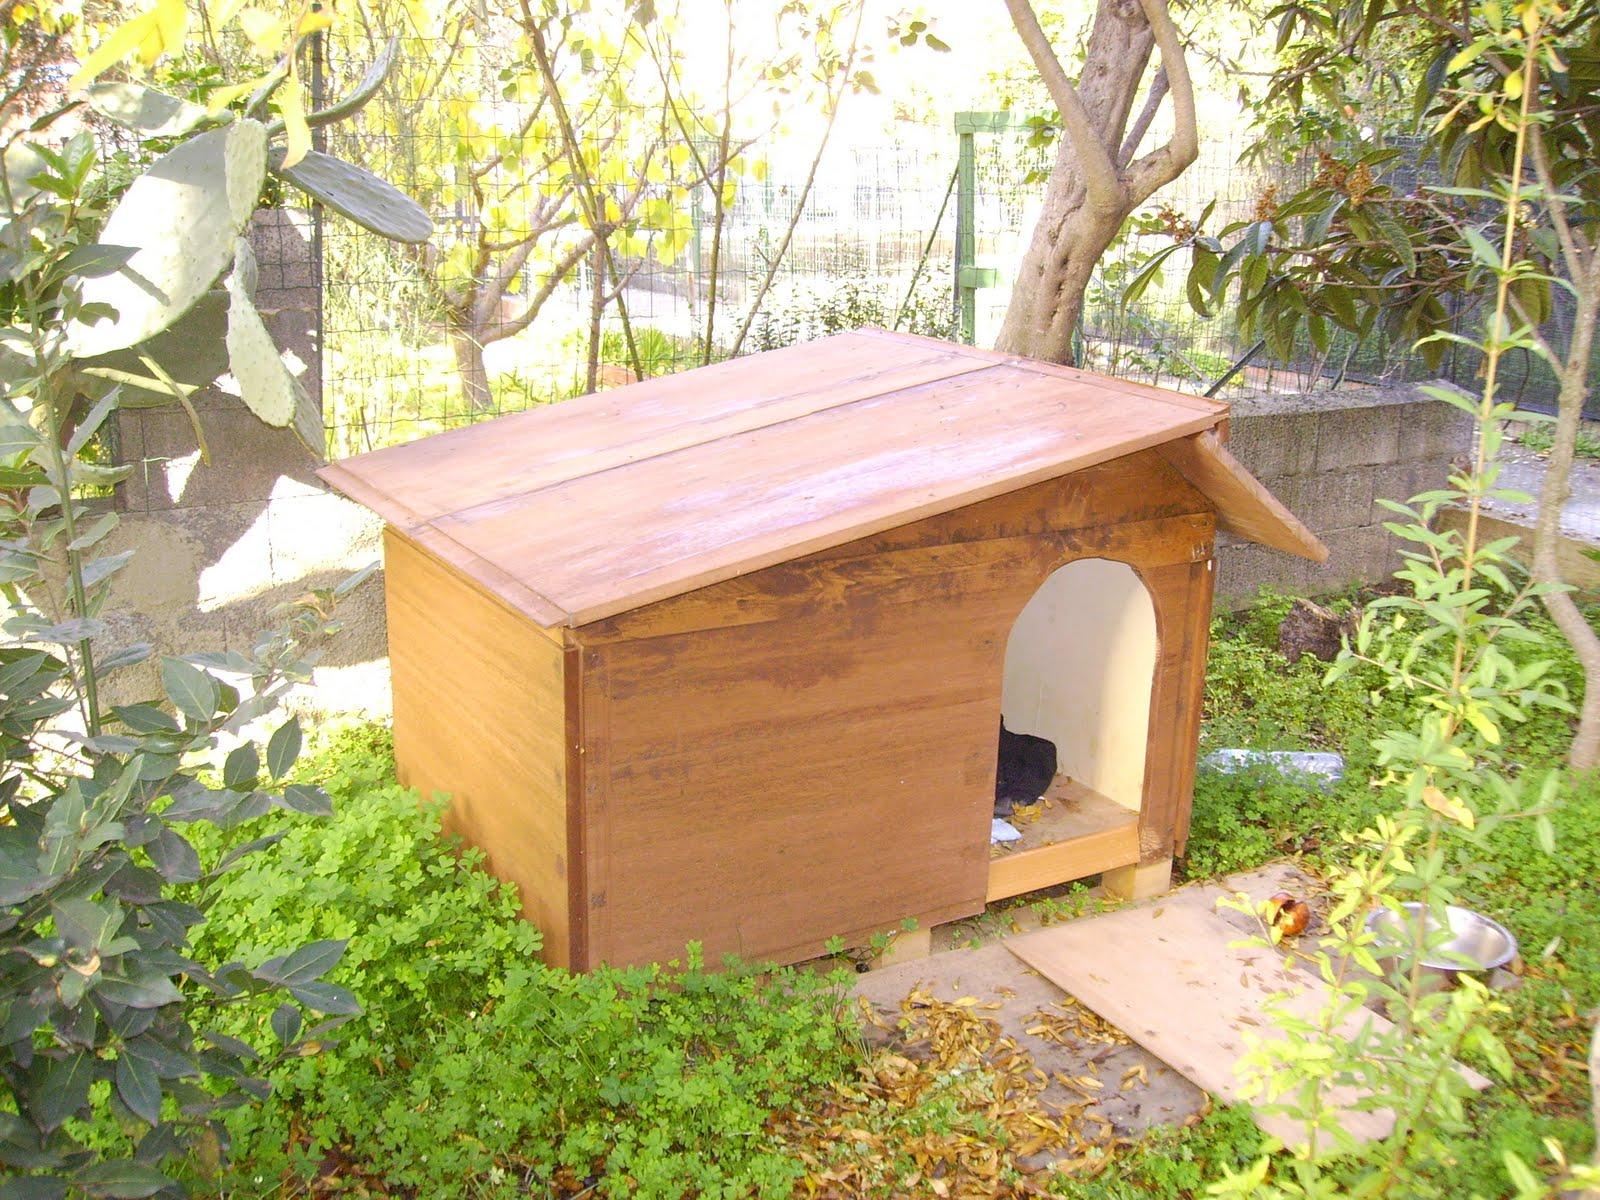 Bricoblog Costruire Una Cuccia Per Cane Tipo Labrador Pastore